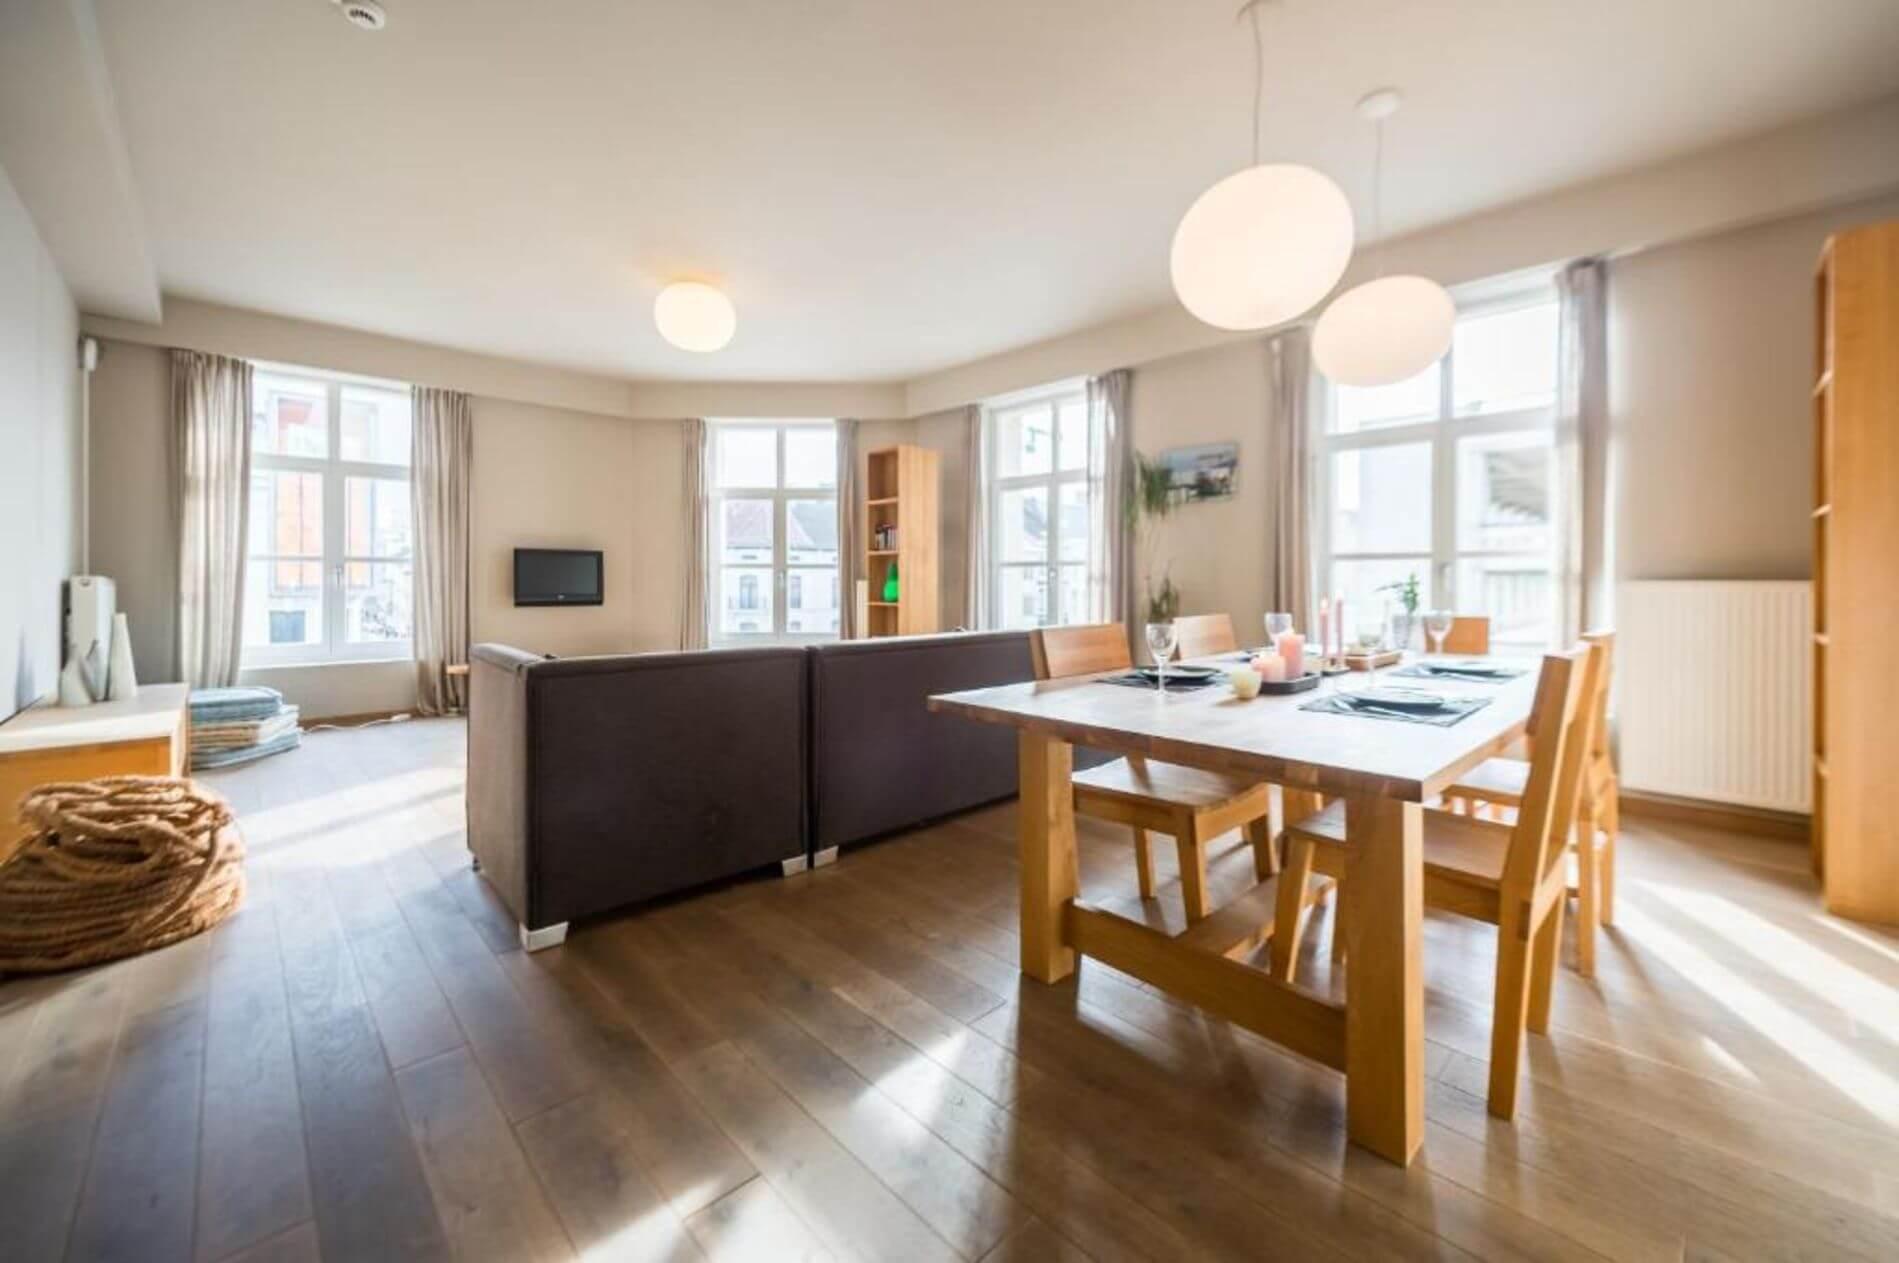 121 m2 Apartment rental in Antwerp with 2 bedrooms